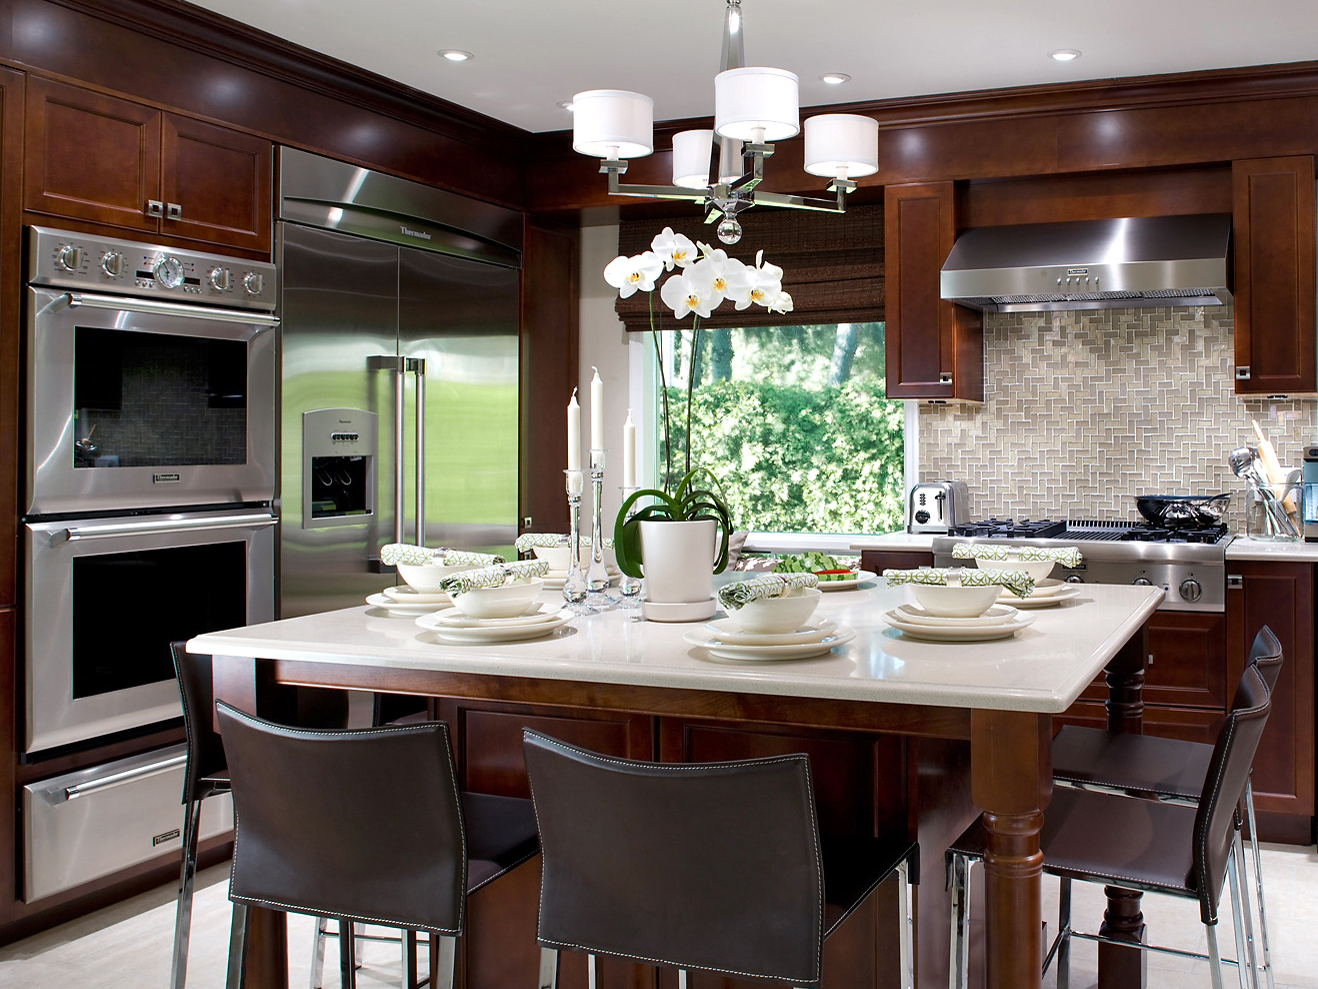 kitchen remodeling ideas photos